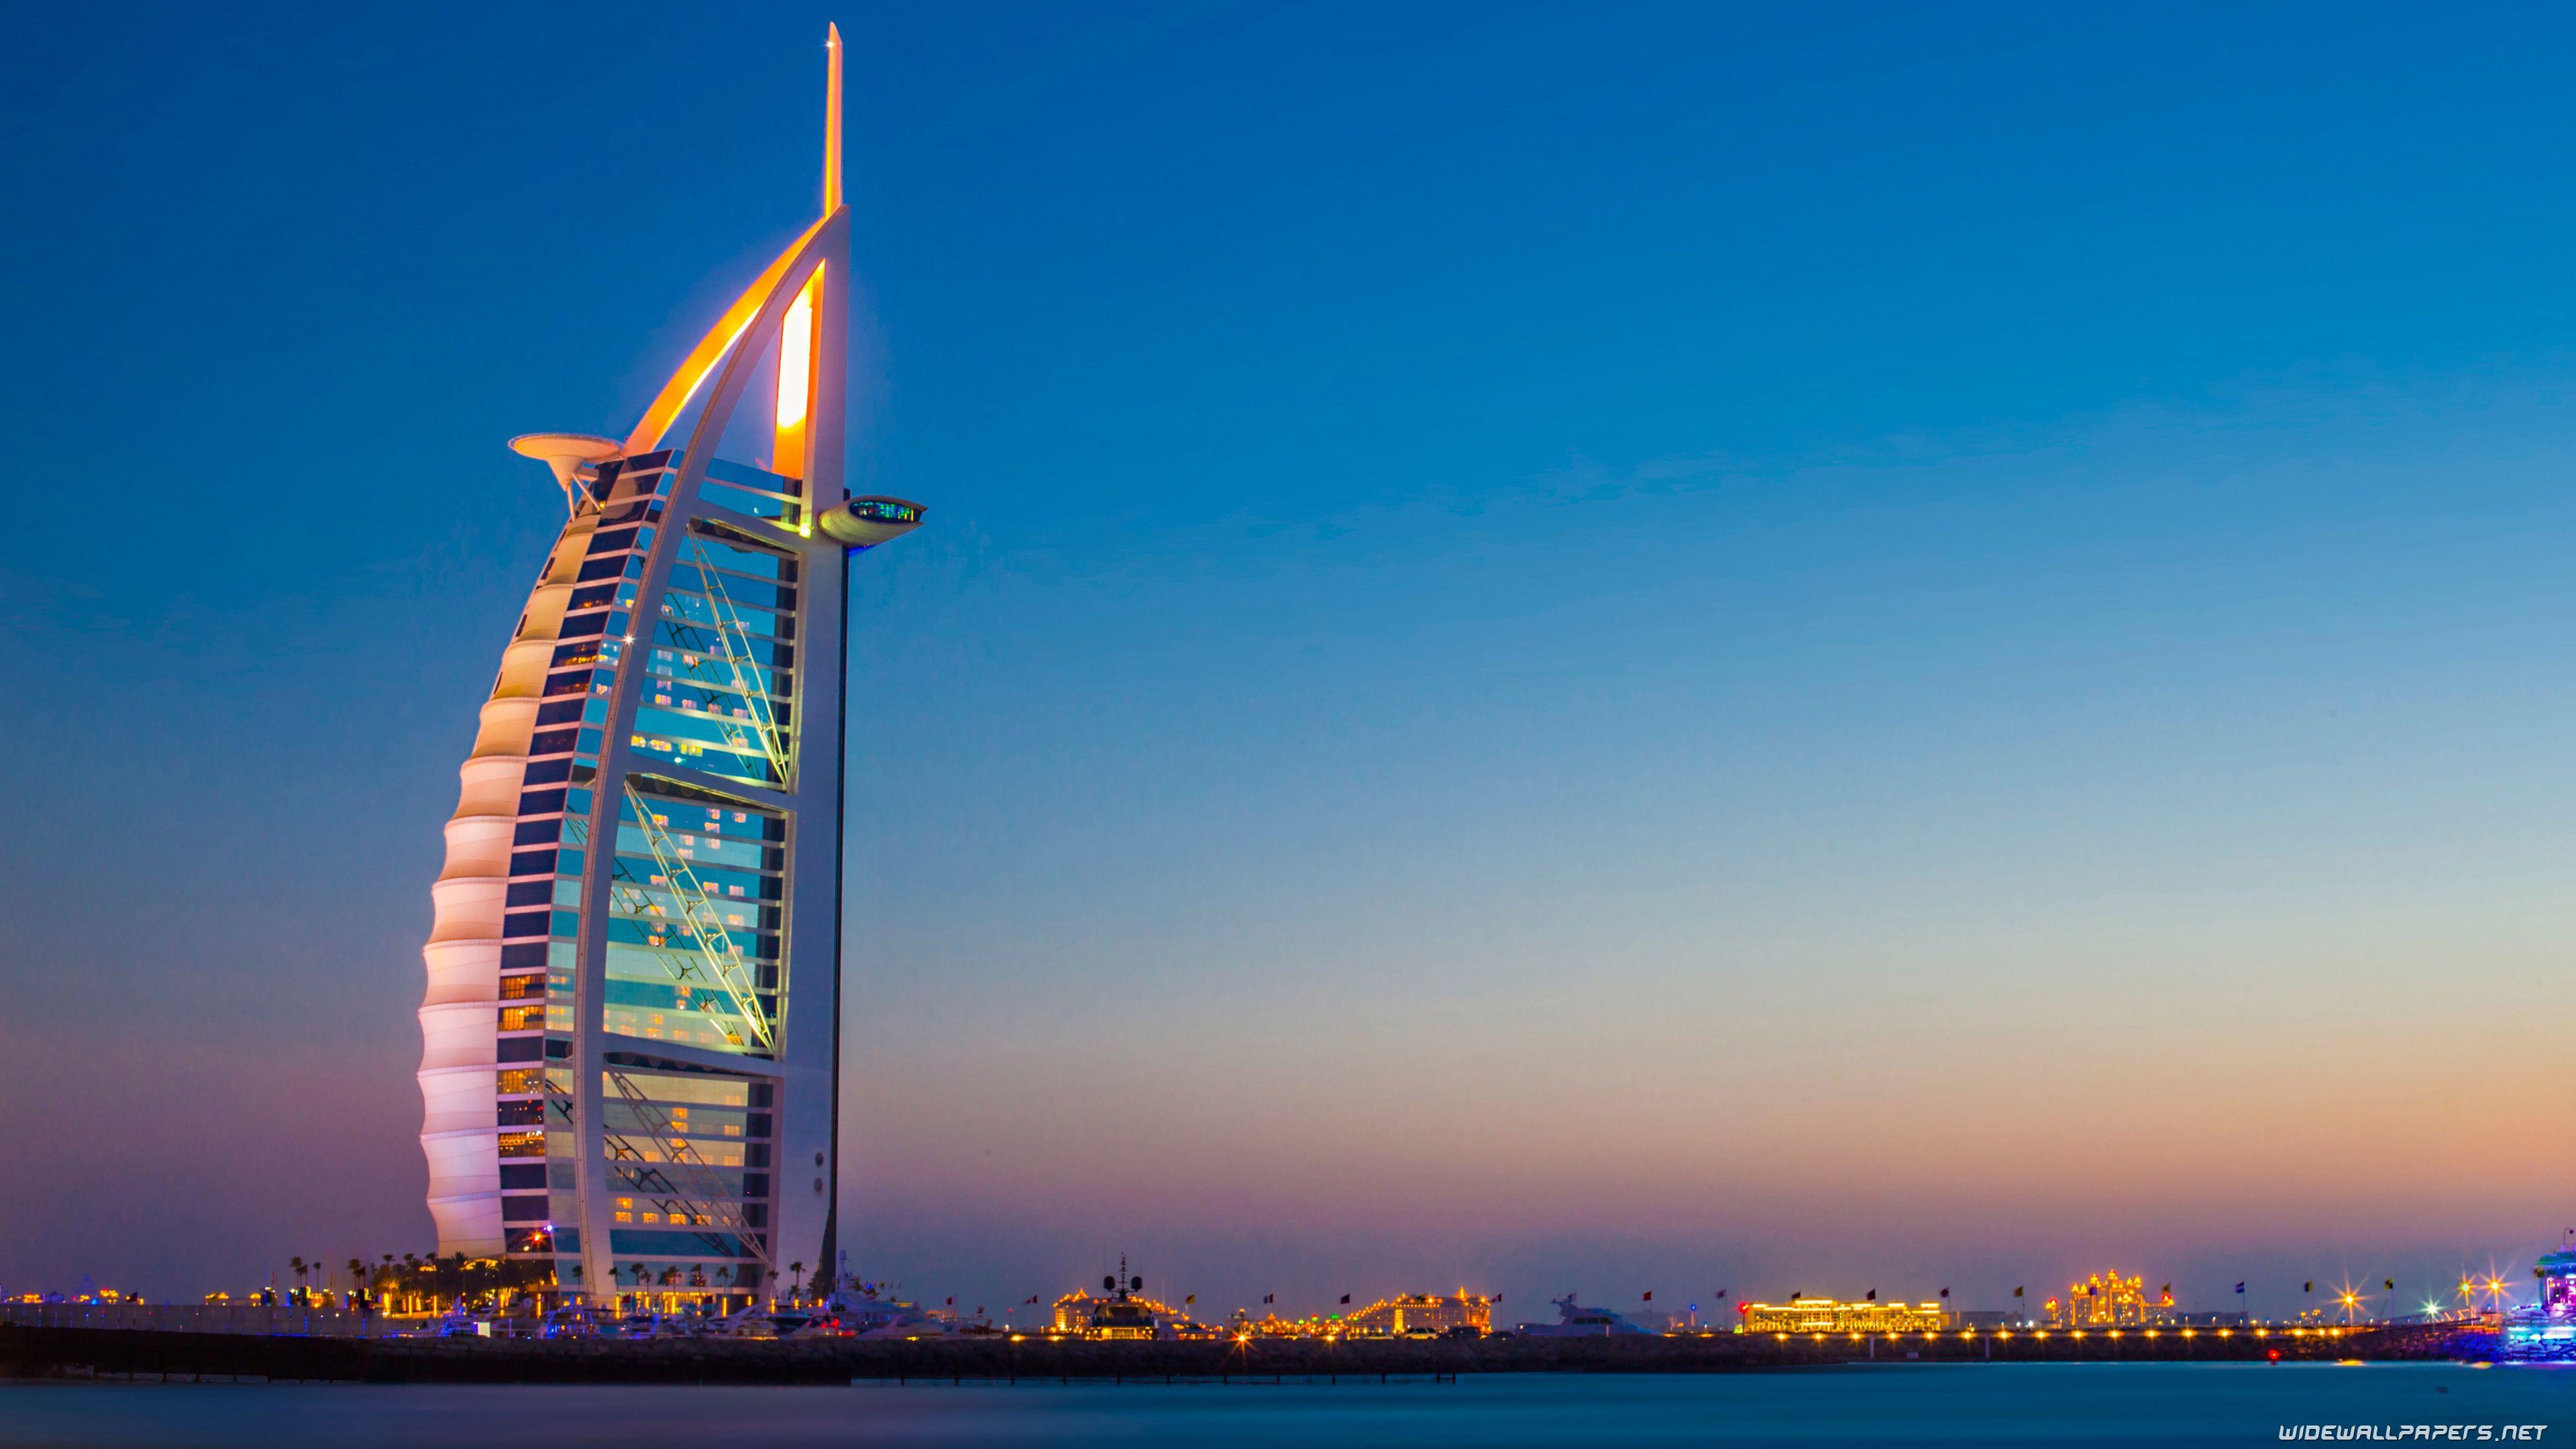 Super Nice Top 10 Recruitment Agencies In Dubai Dubai Wallpaper Hd Dubai Holidays Dubai